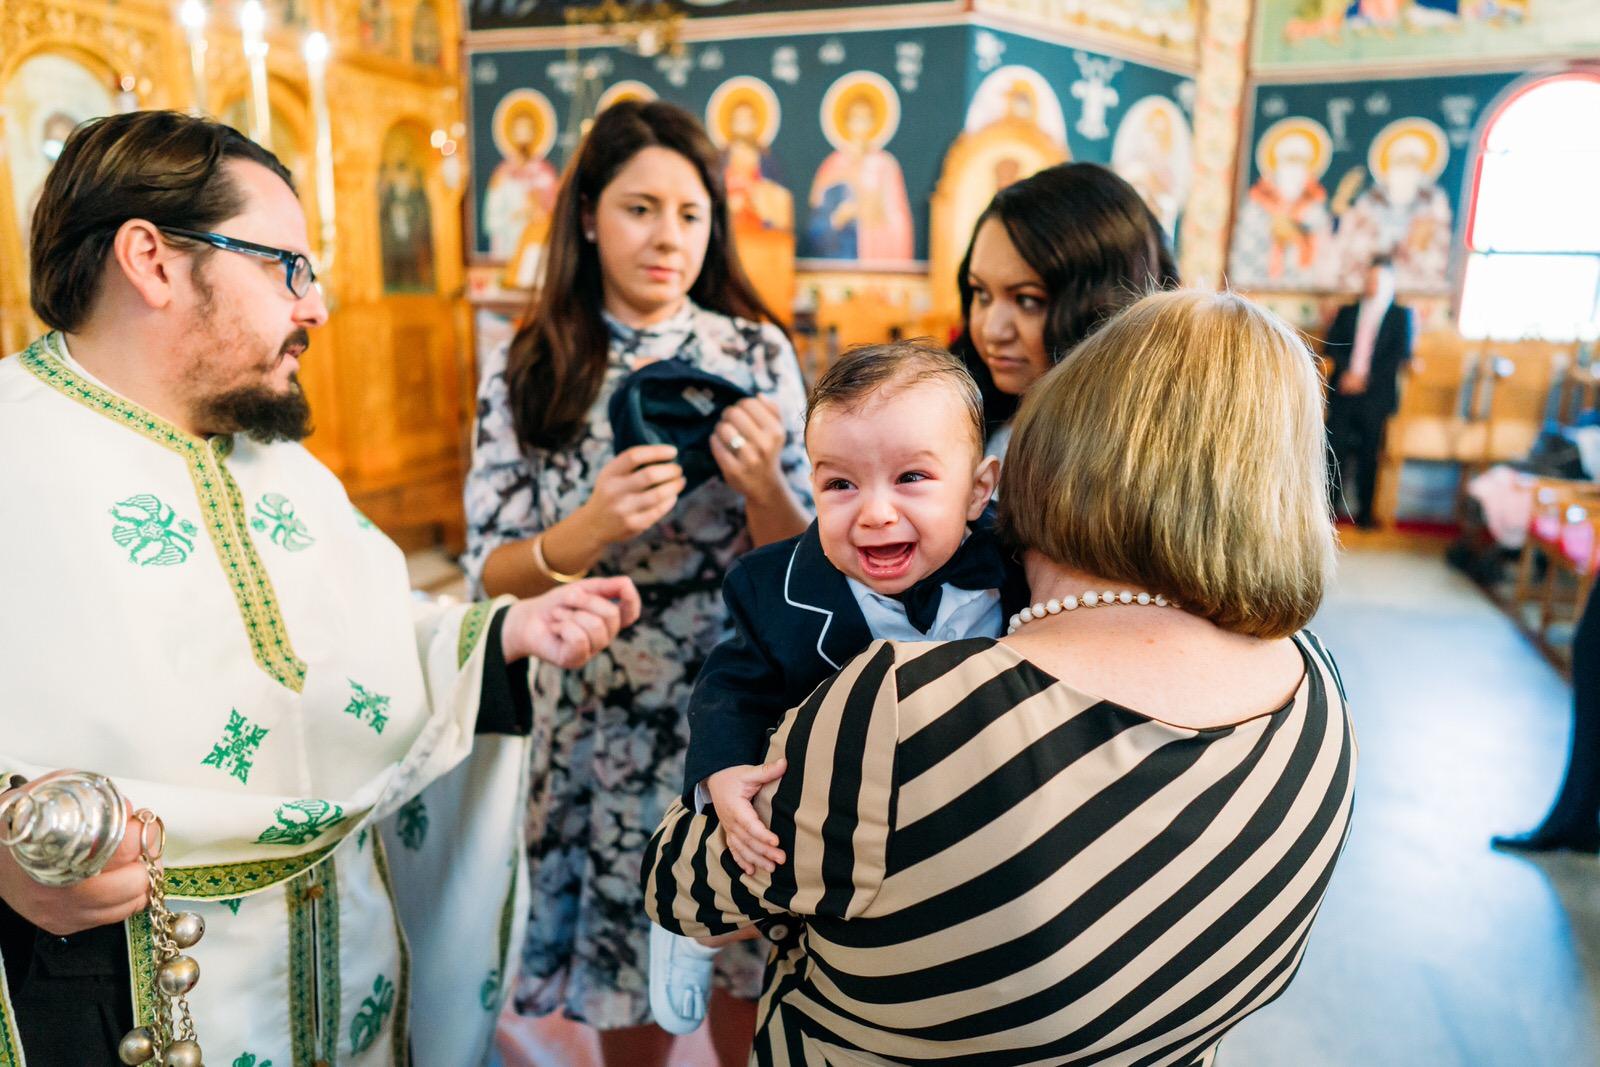 yianni-baptism-st-catherine-orthodox-mascot-laqua-129